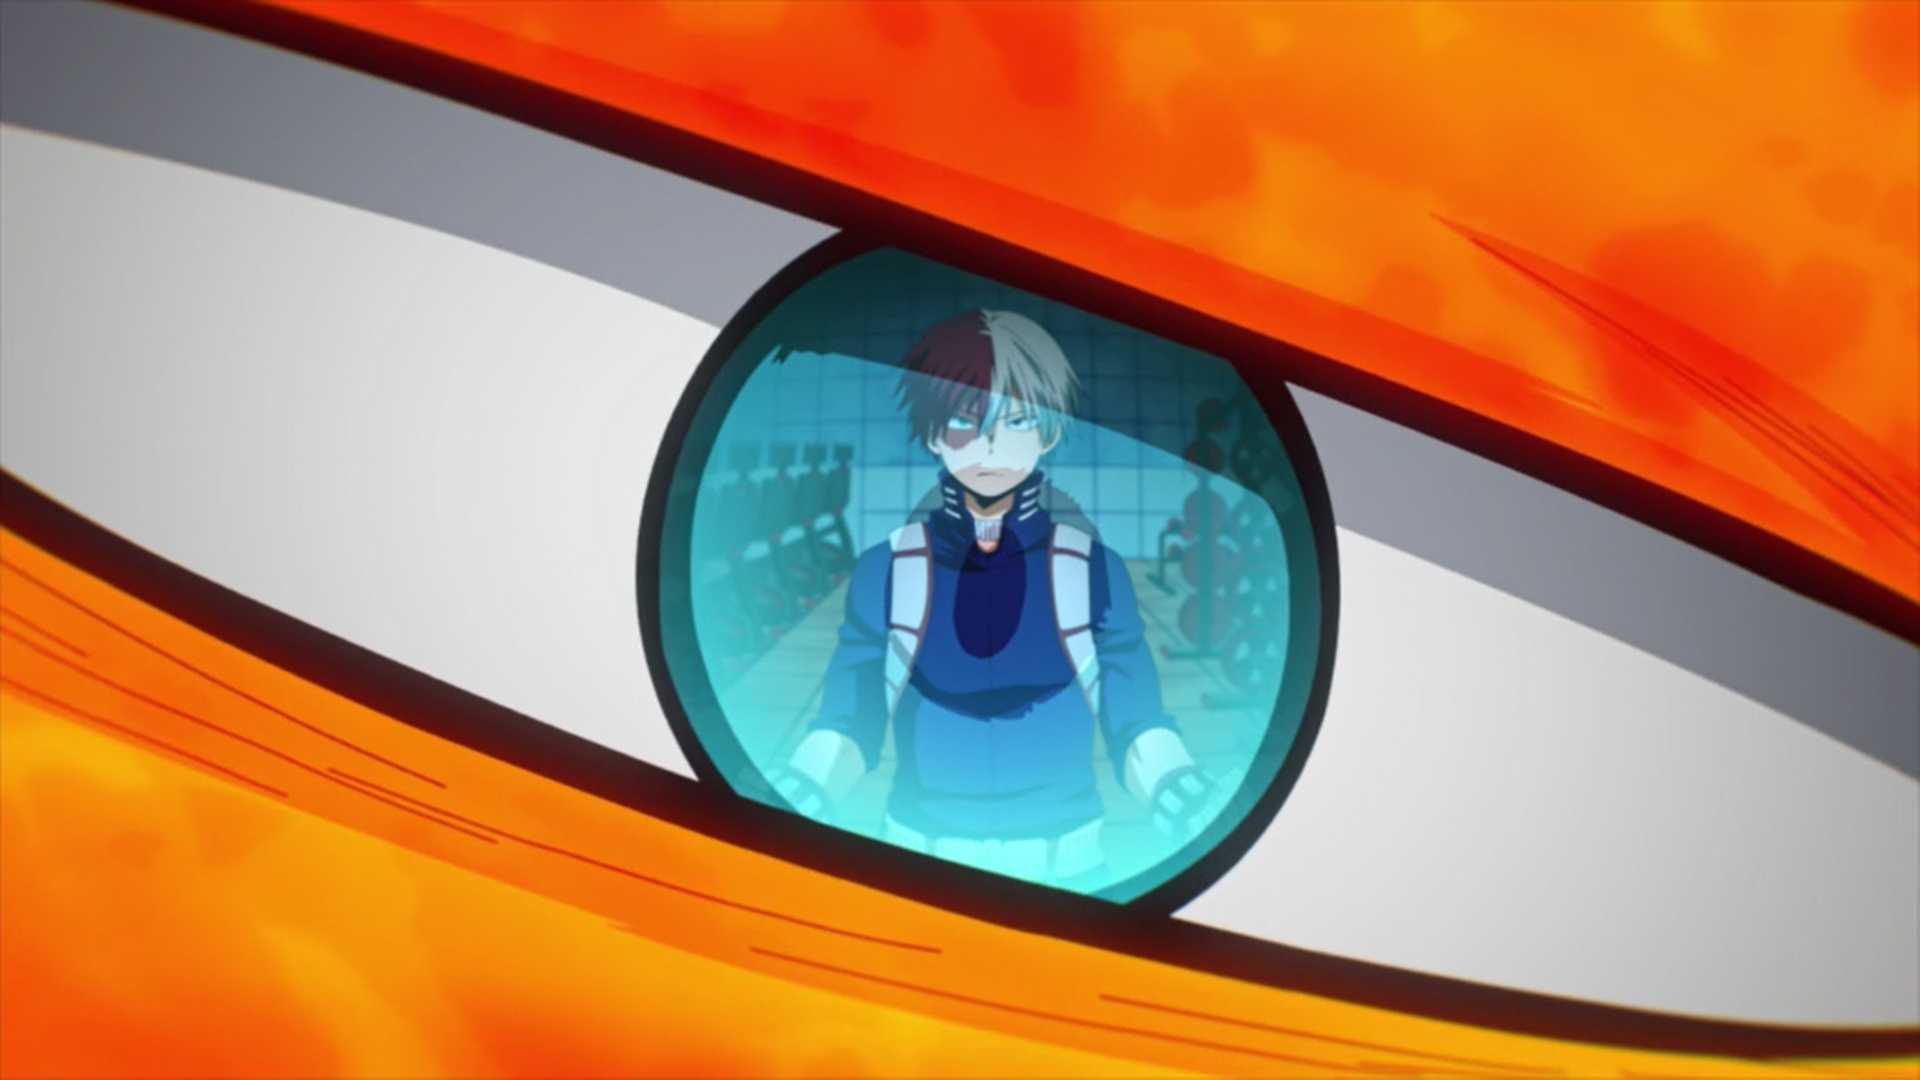 Endeavor My Hero Academia Episode 103